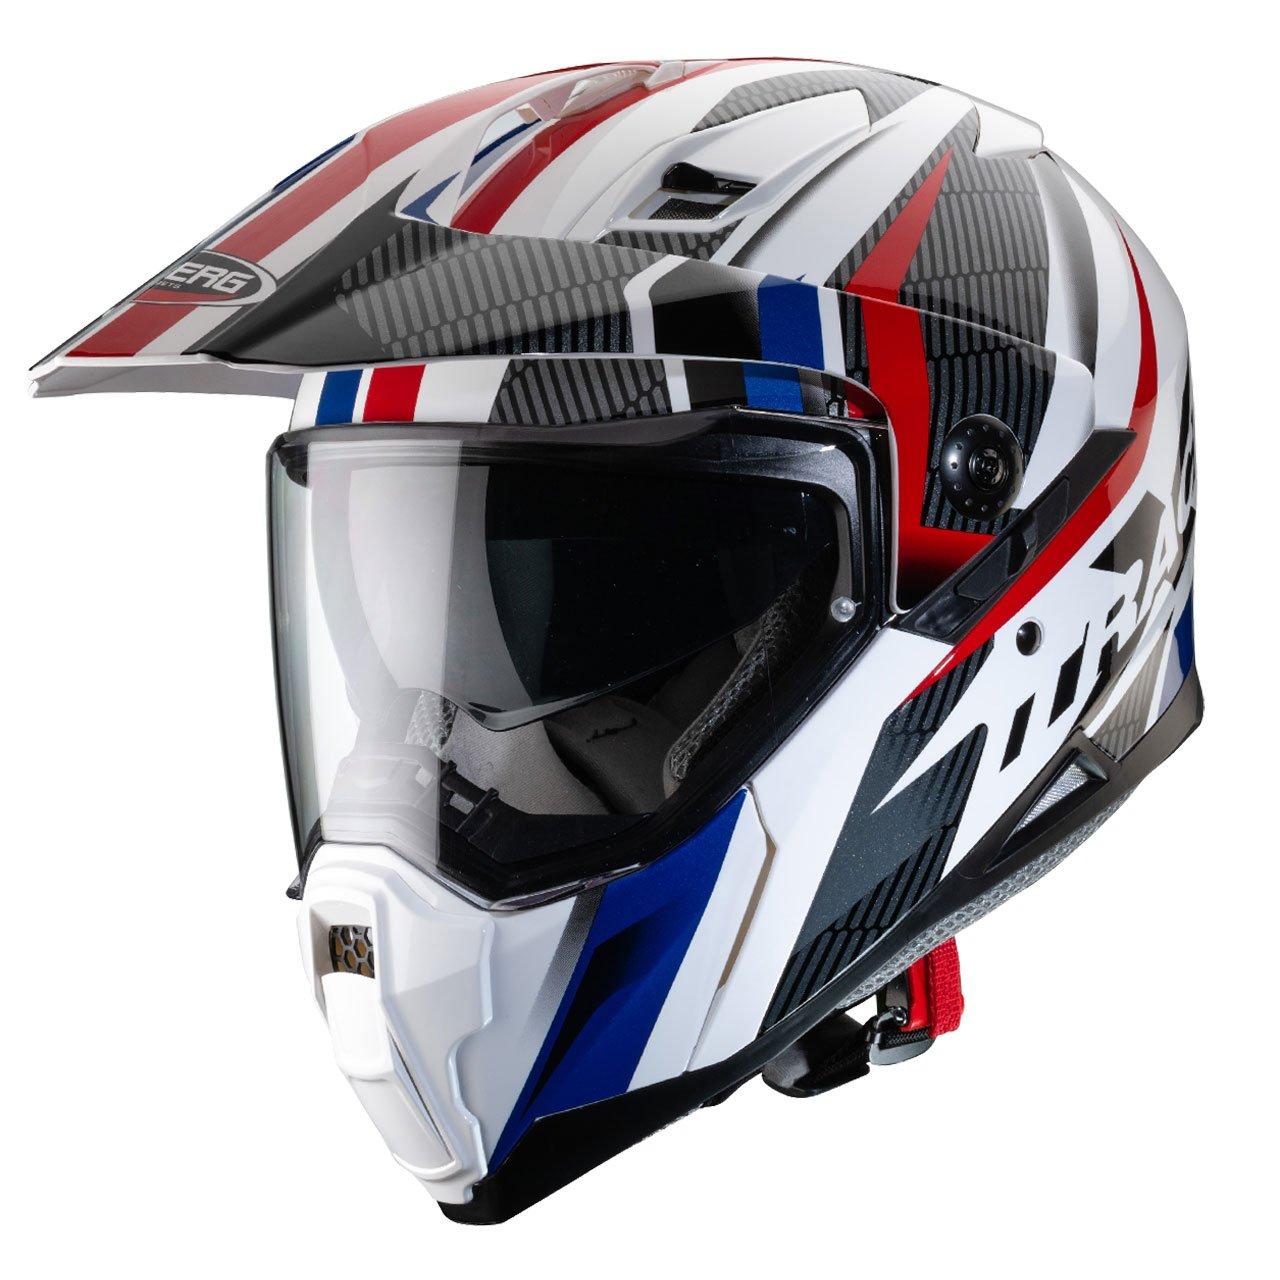 Caberg XTRACE Savana Adventure Helmet